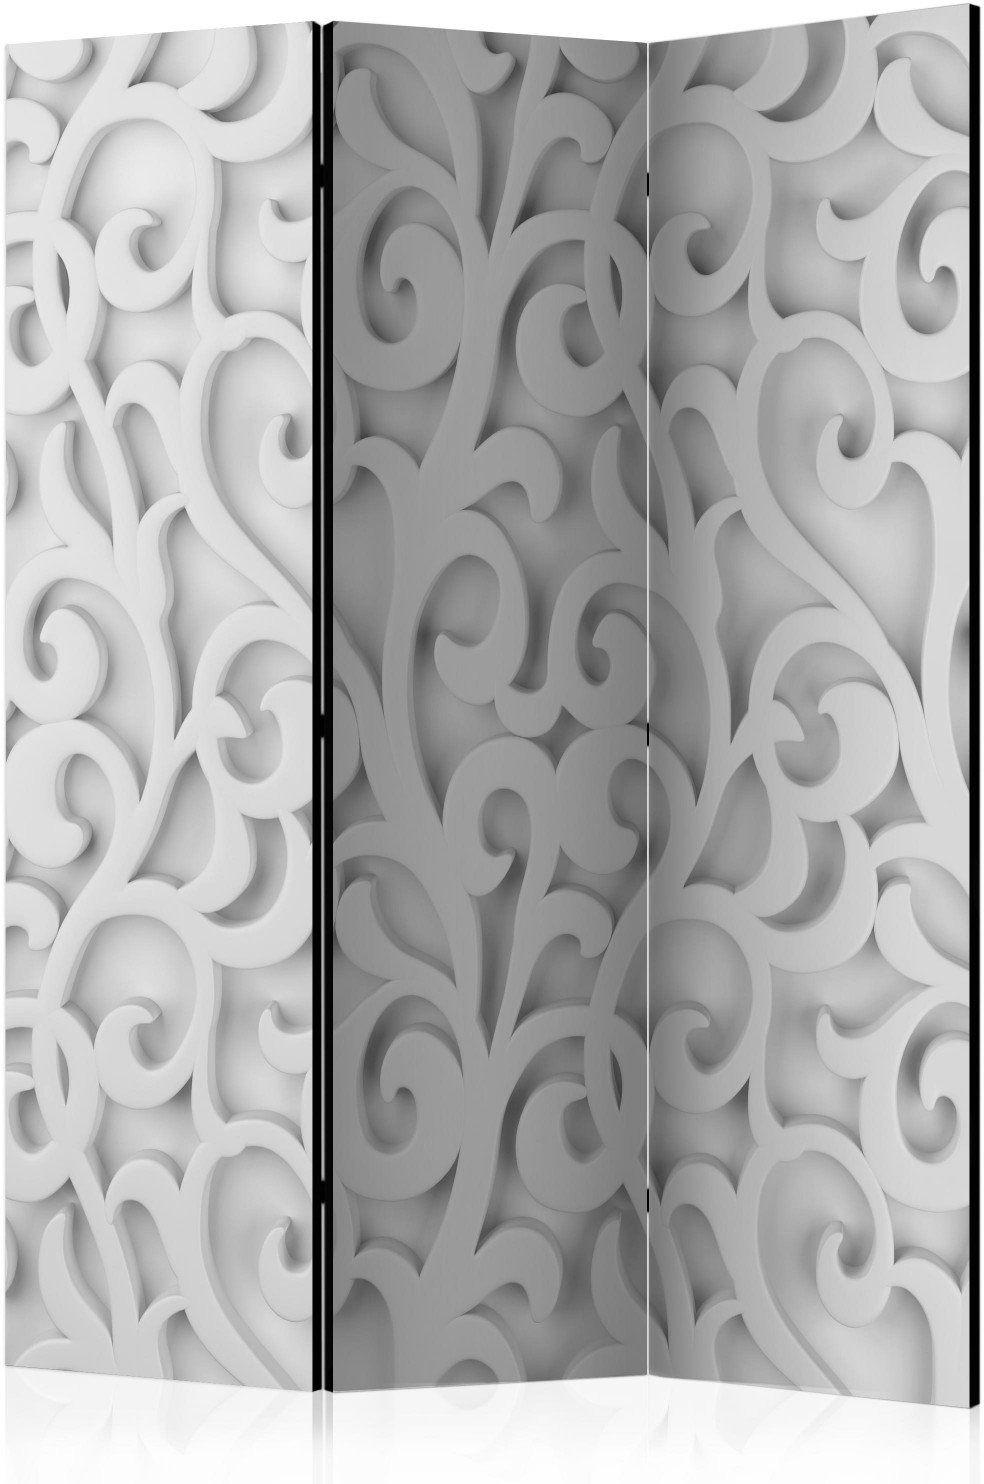 Parawan 3-częściowy - biały ornament [room dividers]